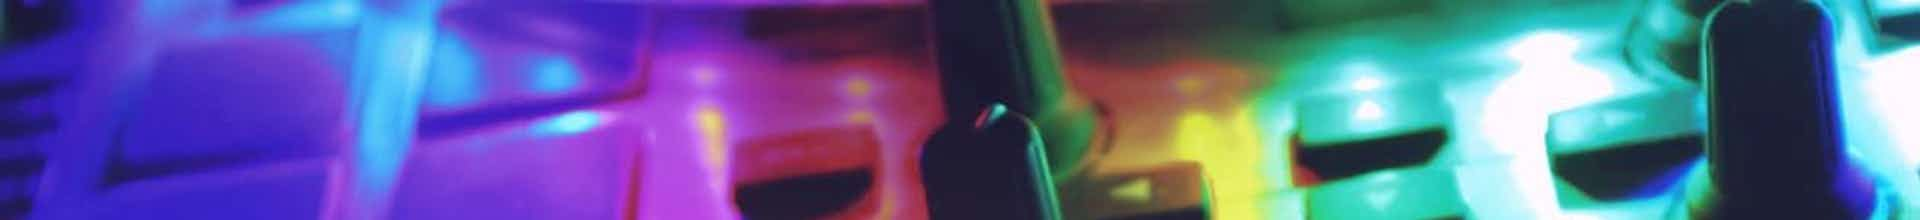 dj-mixer-lichtjes.jpeg